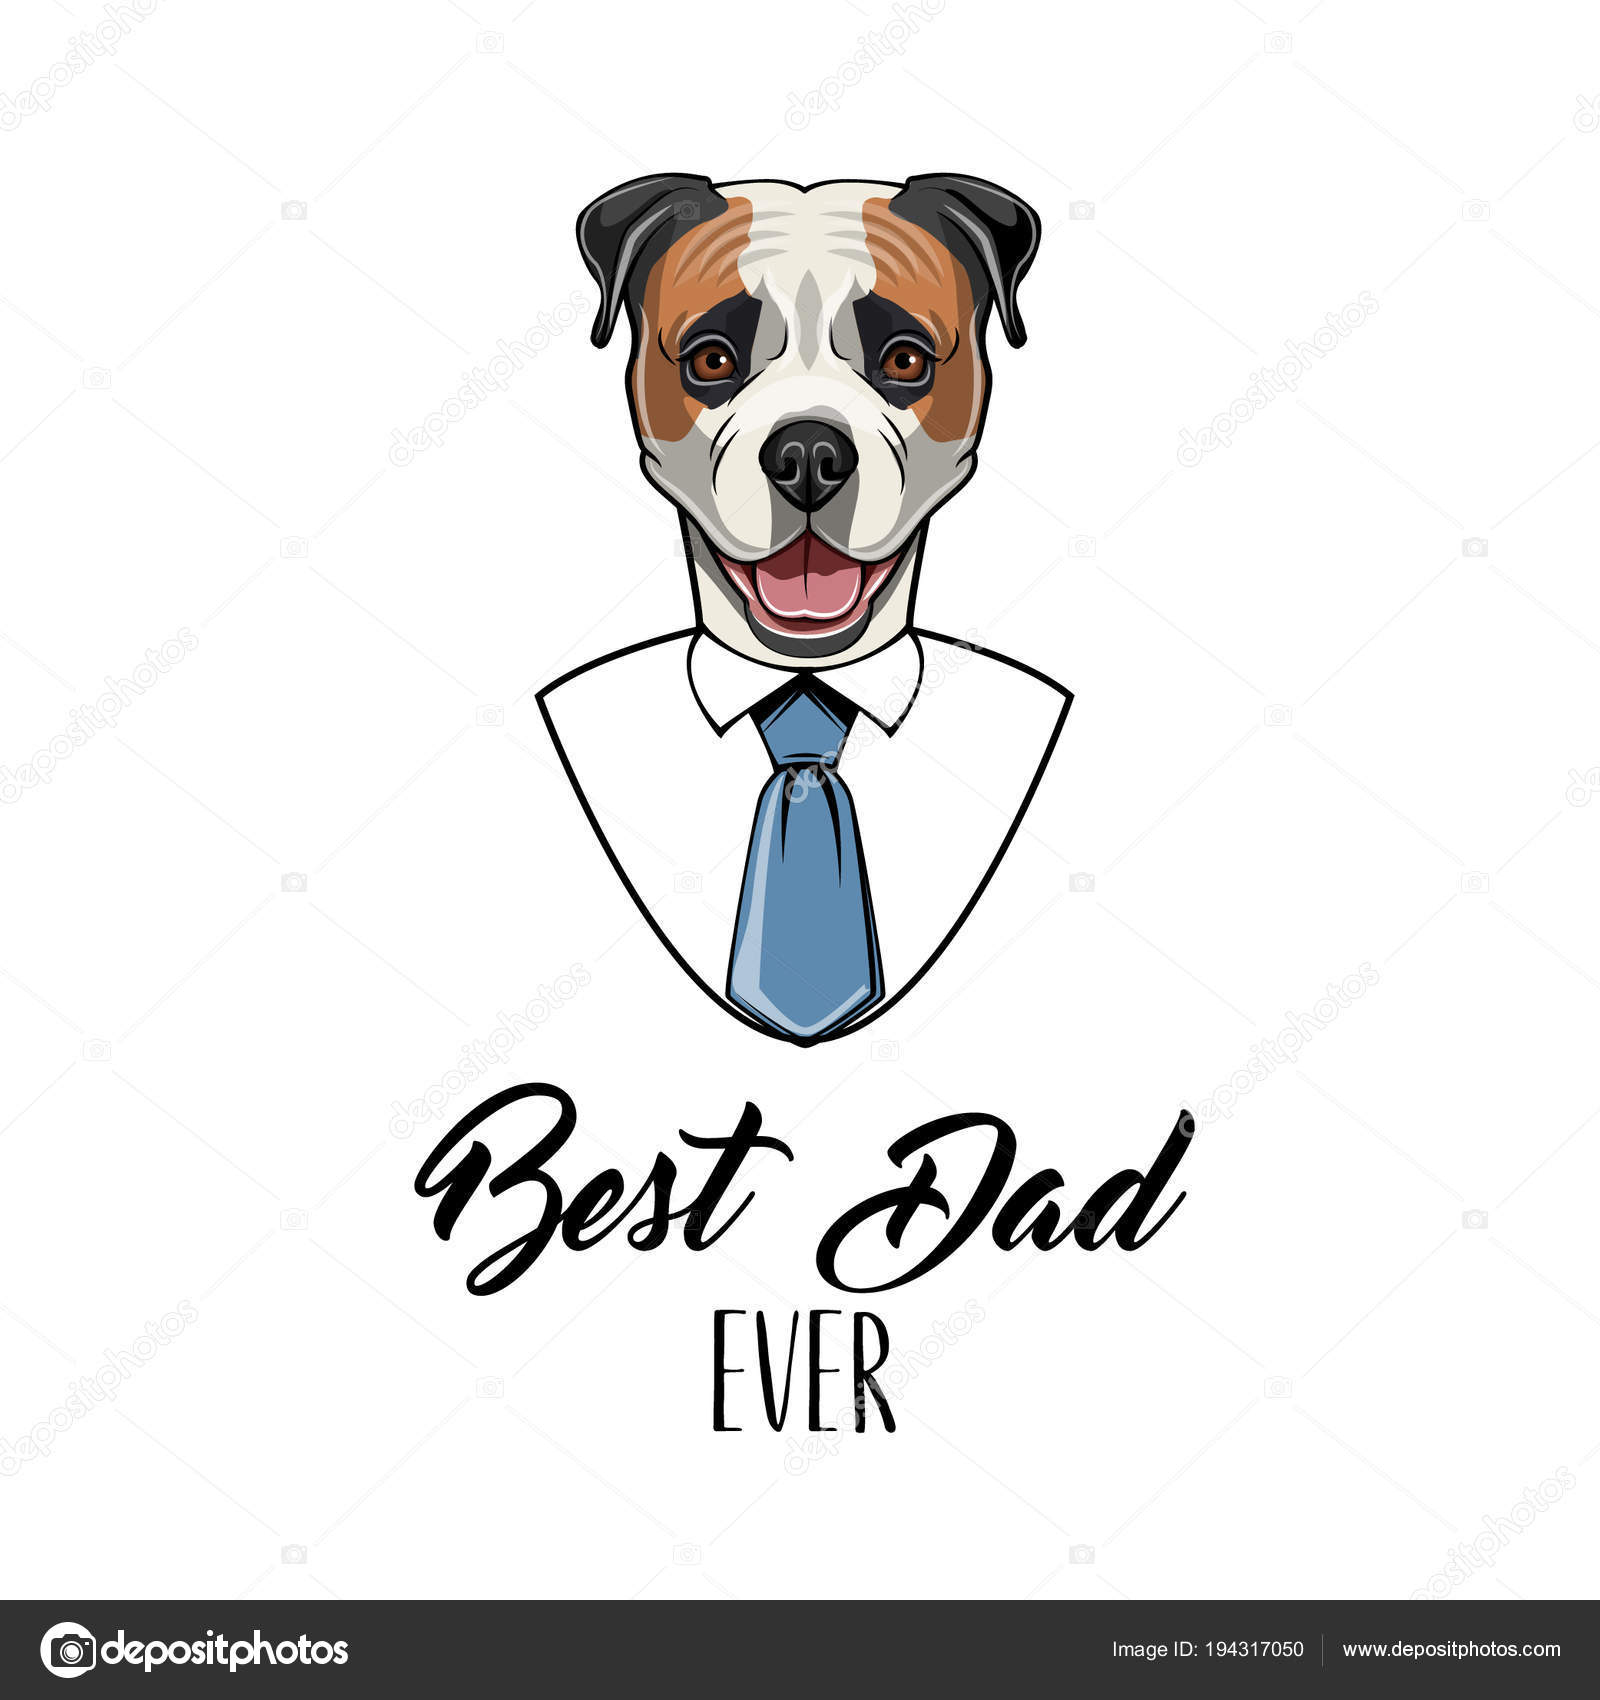 029383b538cc2 American bulldog dog. Fathers day greeting card. Best dad ever text. Shirt